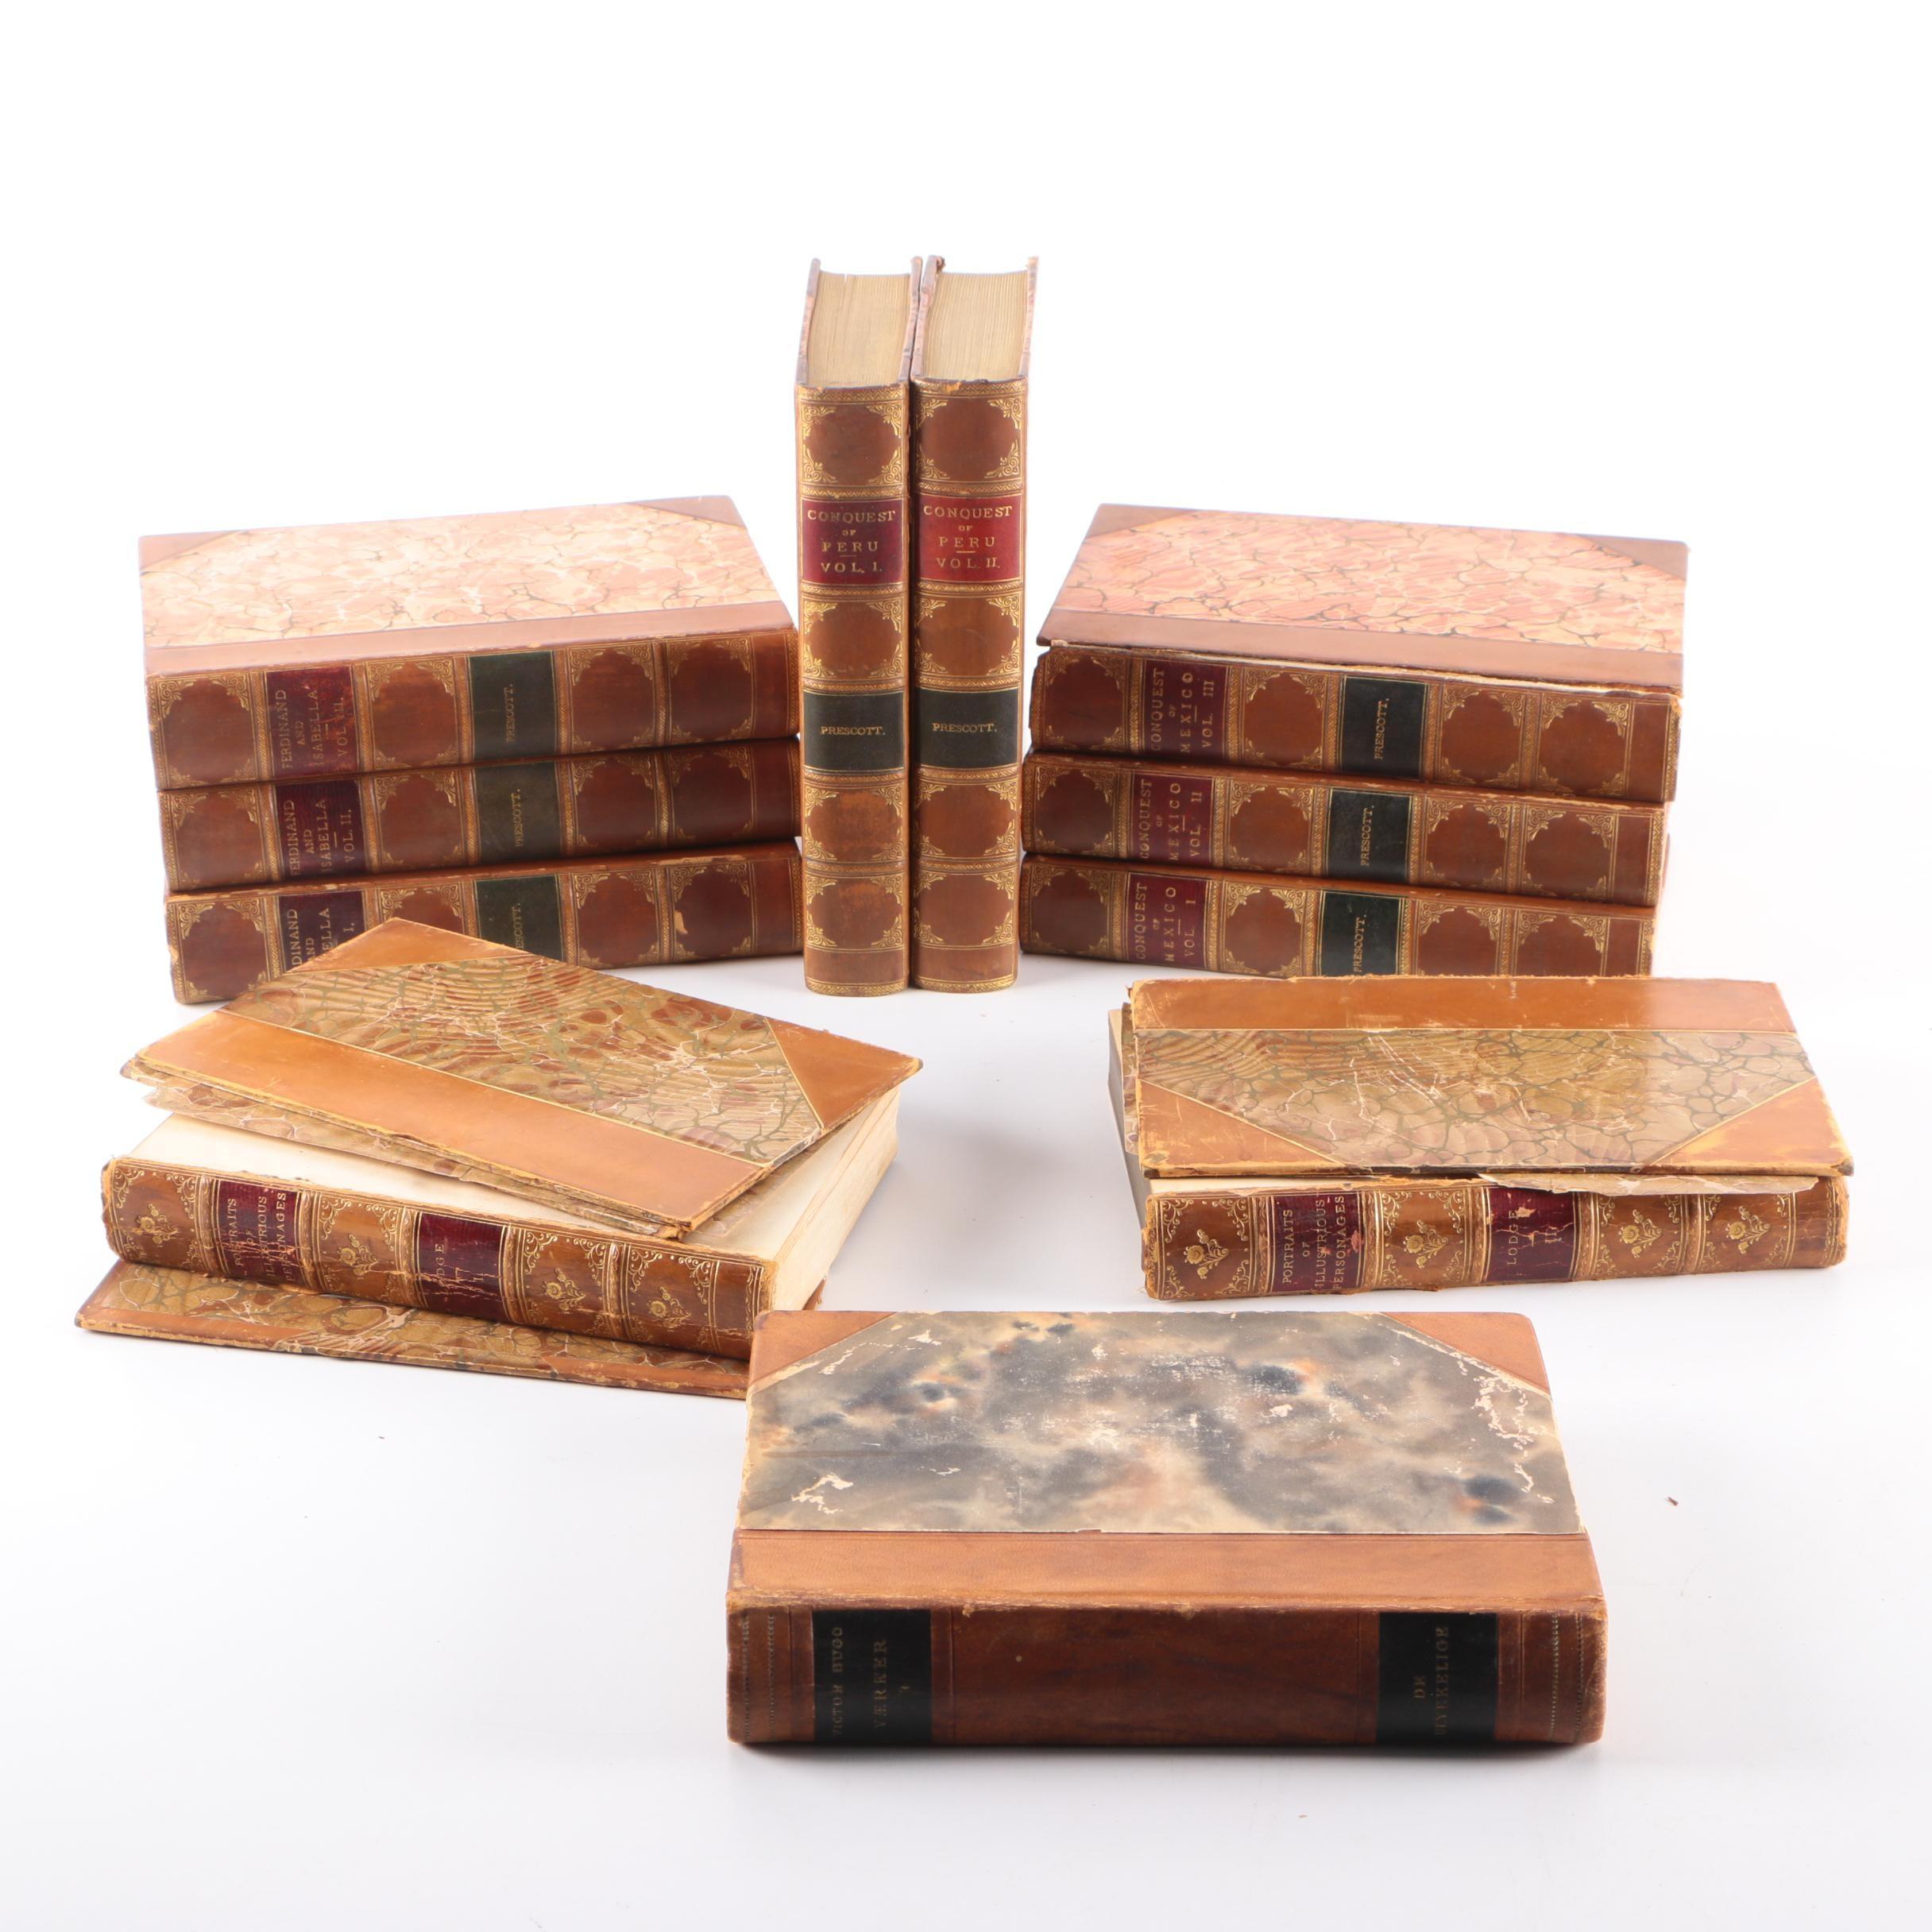 "Antique Books Including 1893 ""Conquest of Mexico"" by William H. Prescott"